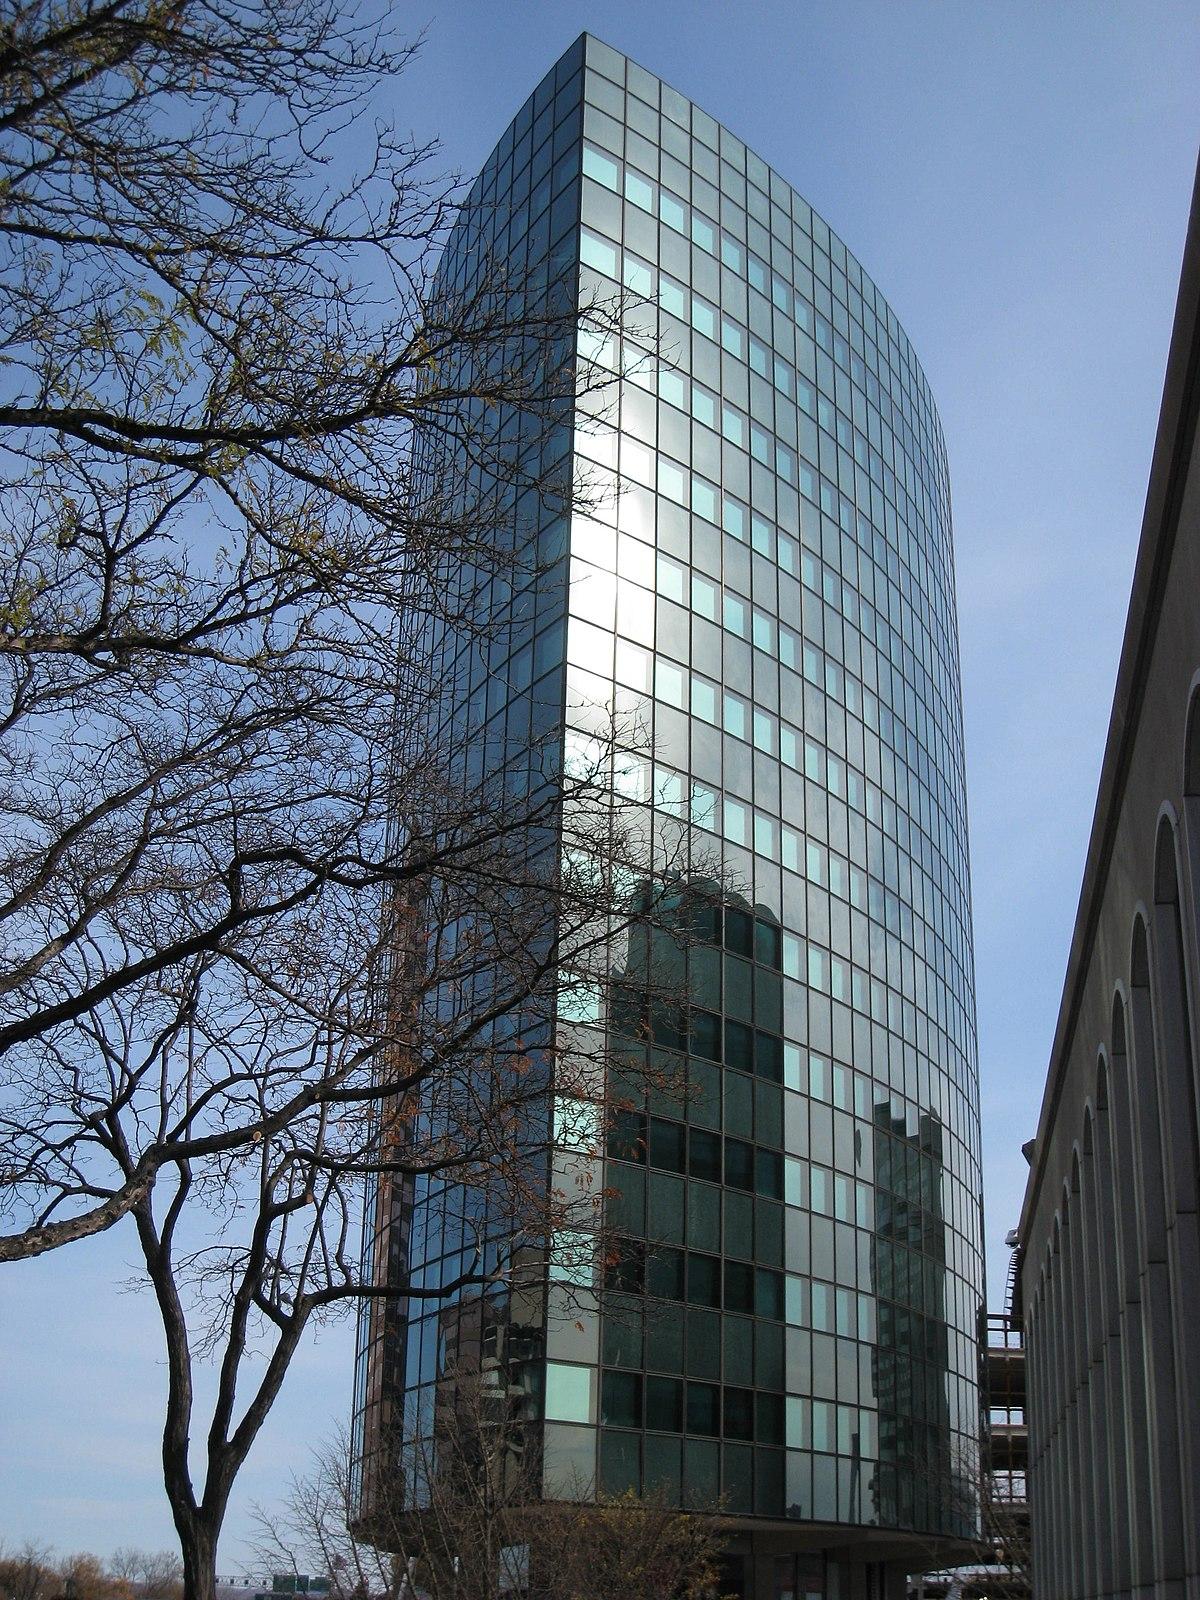 Connecticut Mutual Insurance